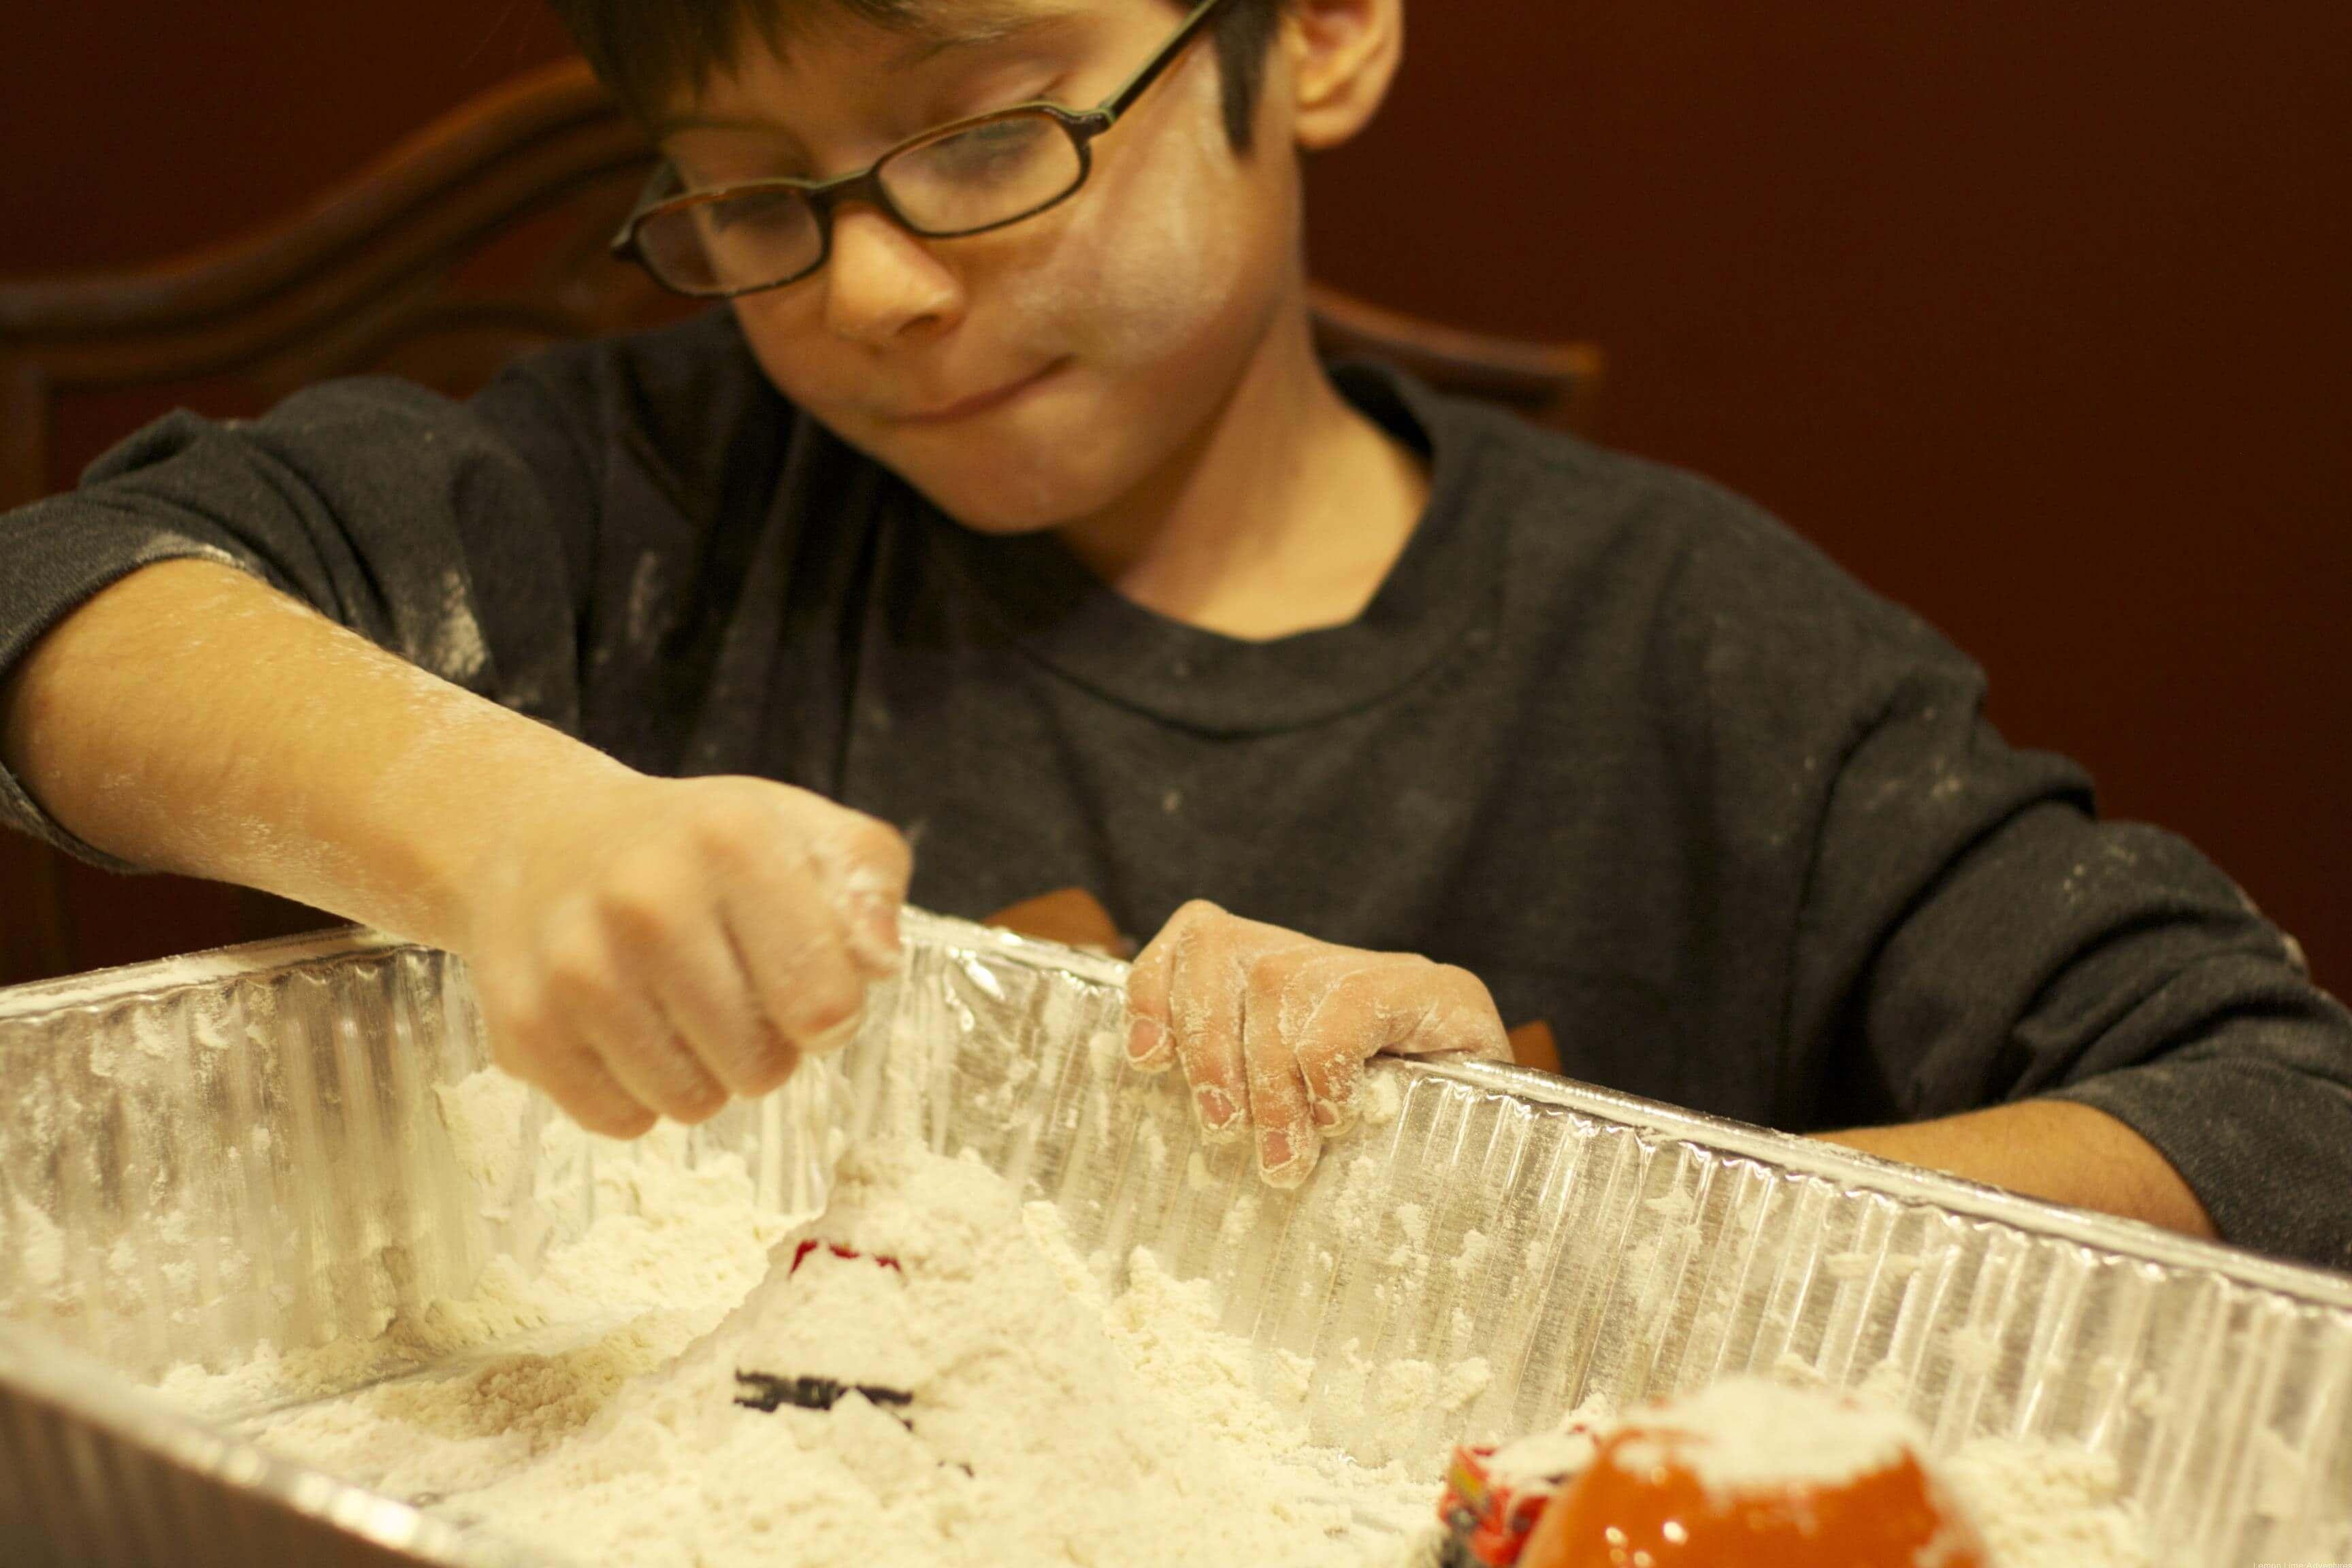 Flour Sensory Play